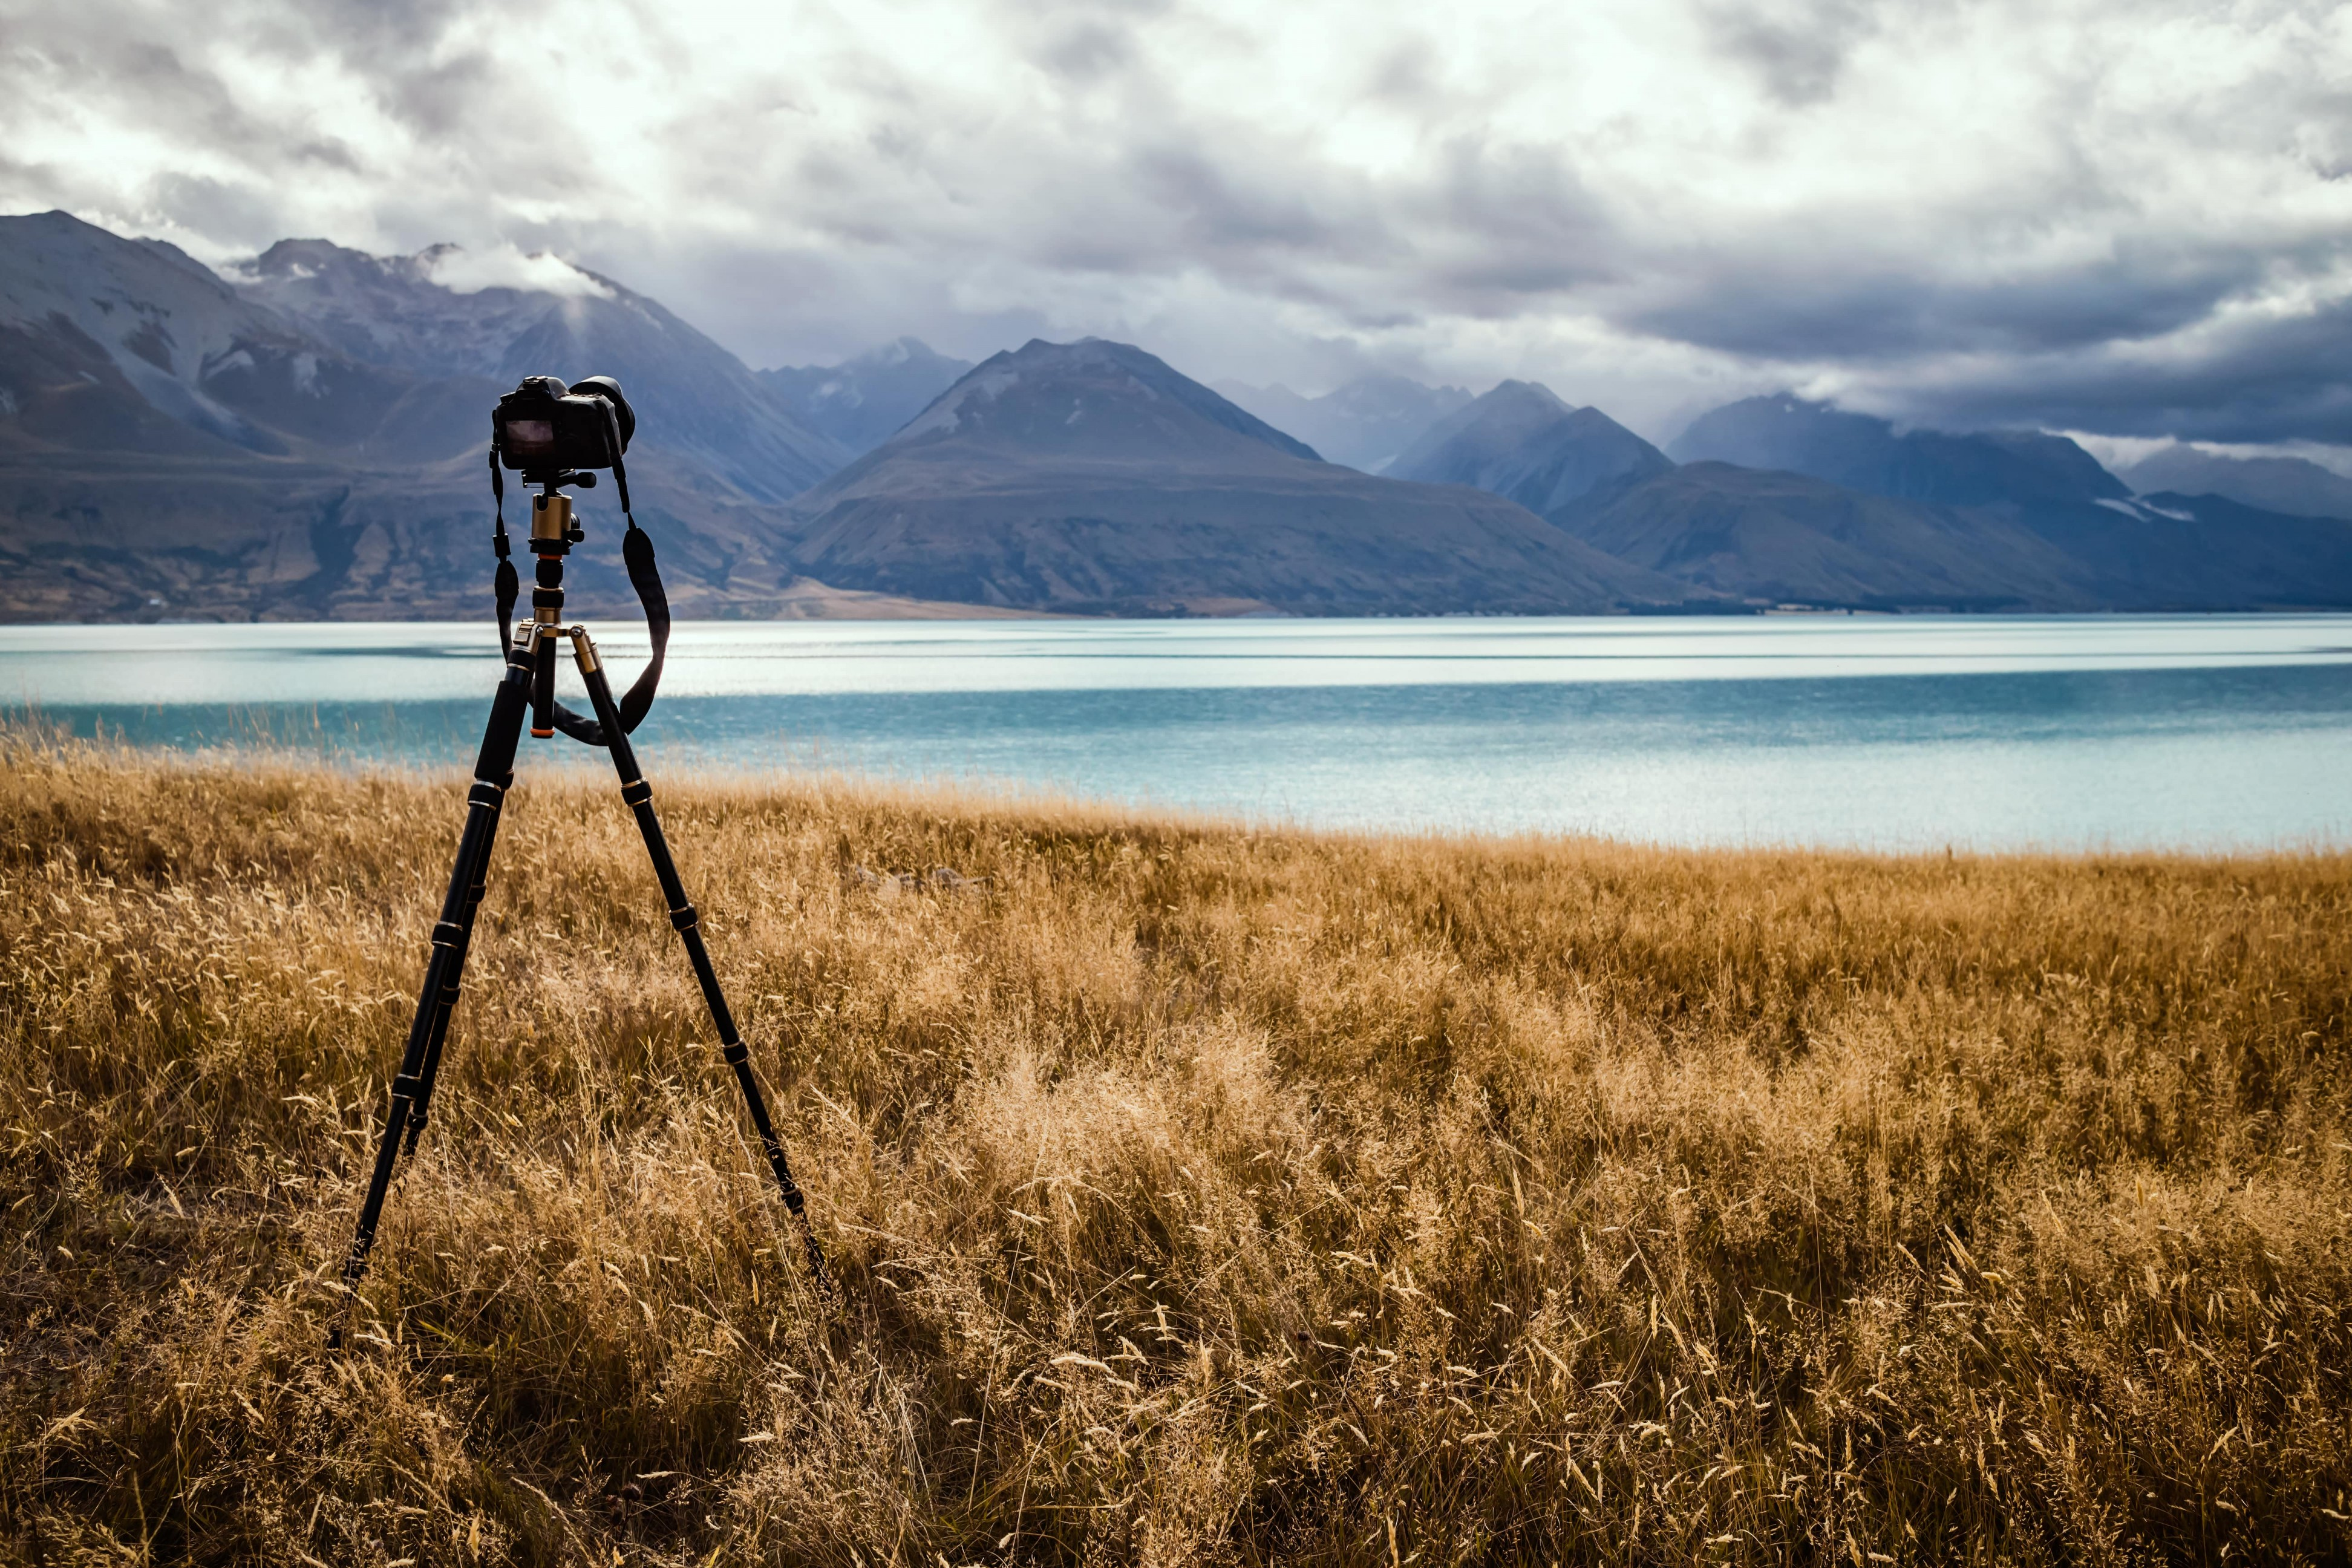 photography; photo editing; image editing;